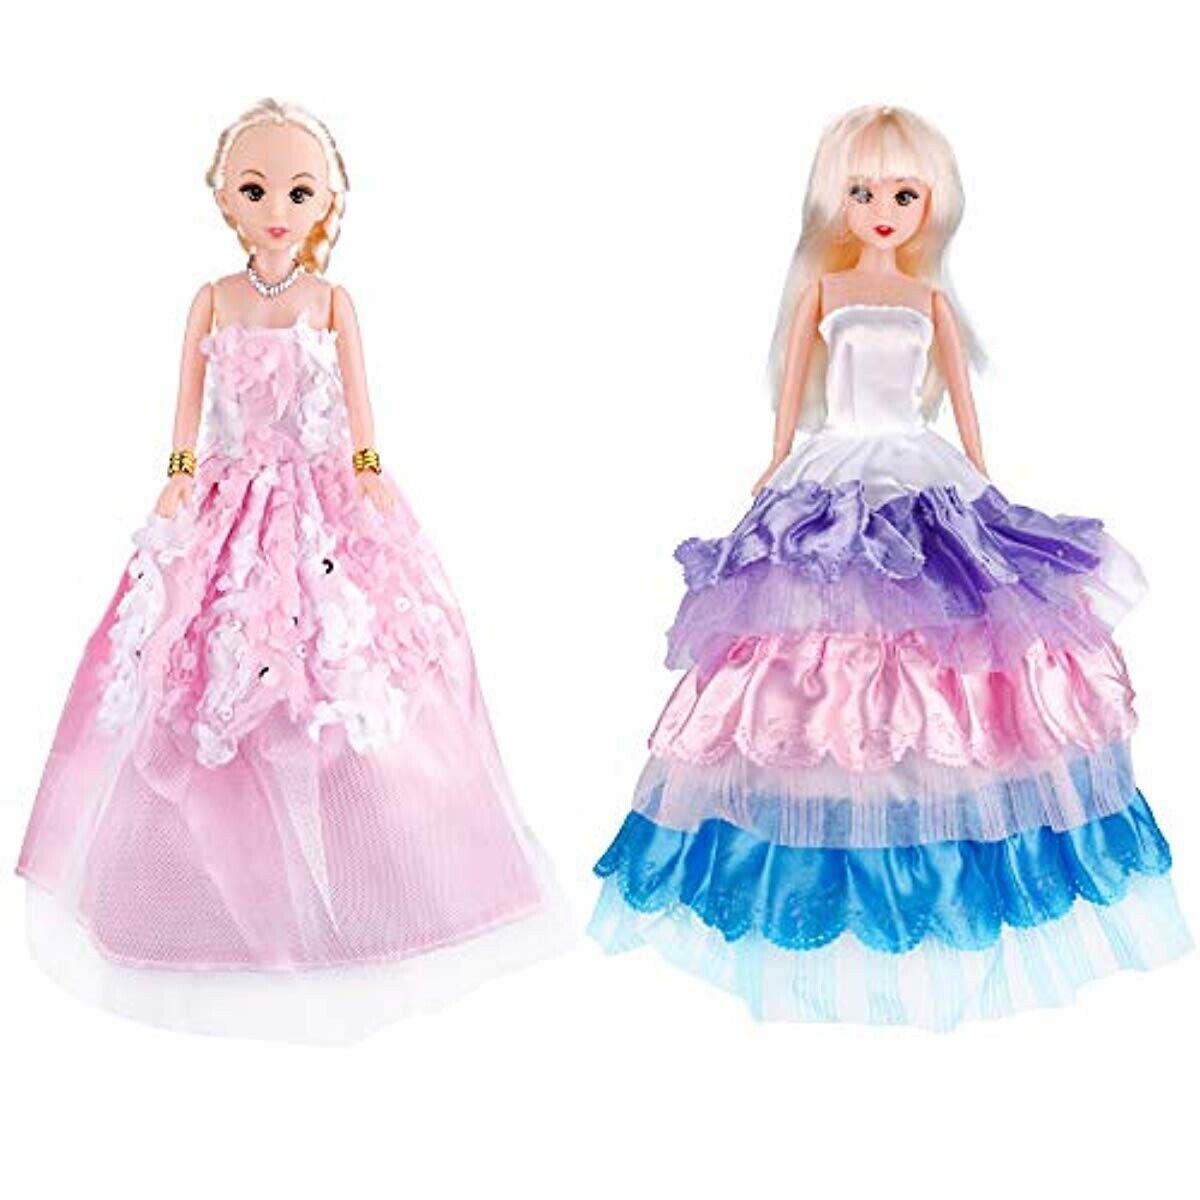 73PCS For Barbie Doll Clothes Party Gown Shoes Bag Necklace Hanger Accessories 4